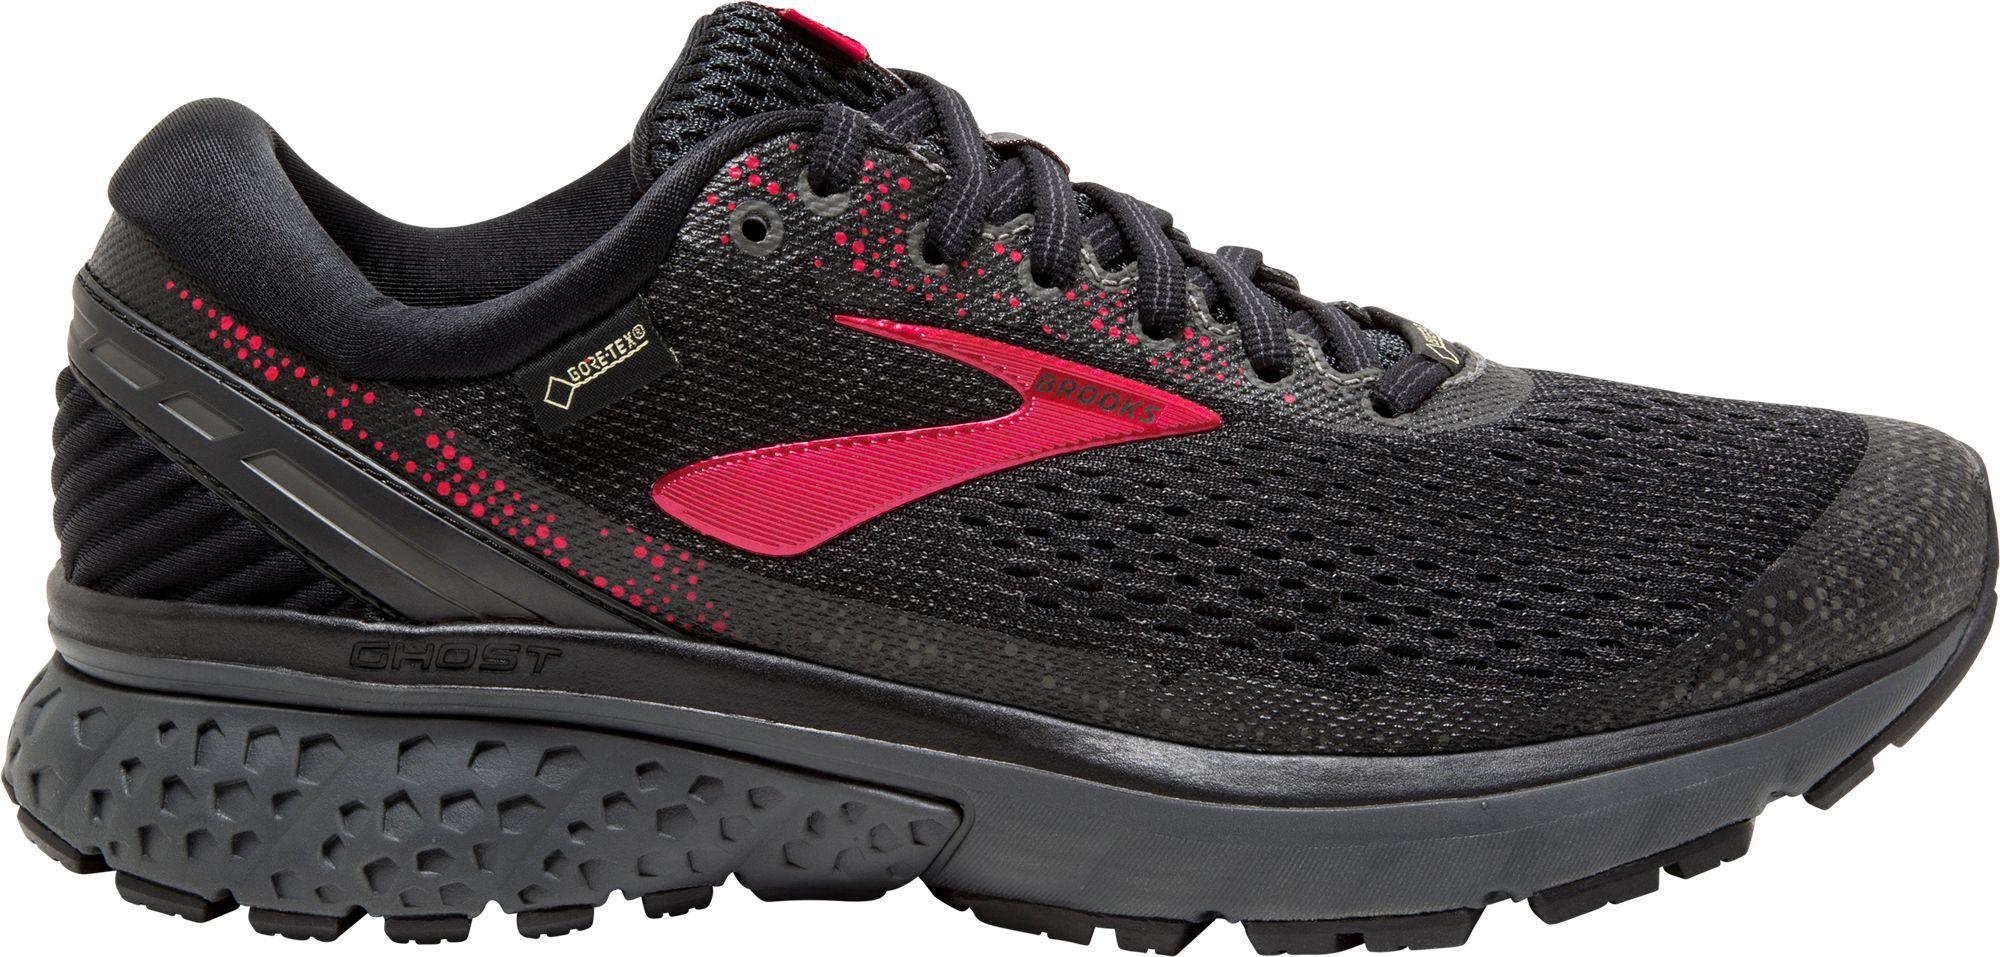 c2e0216eb9486 Brooks Women s Ghost 11 GTX Running Shoes